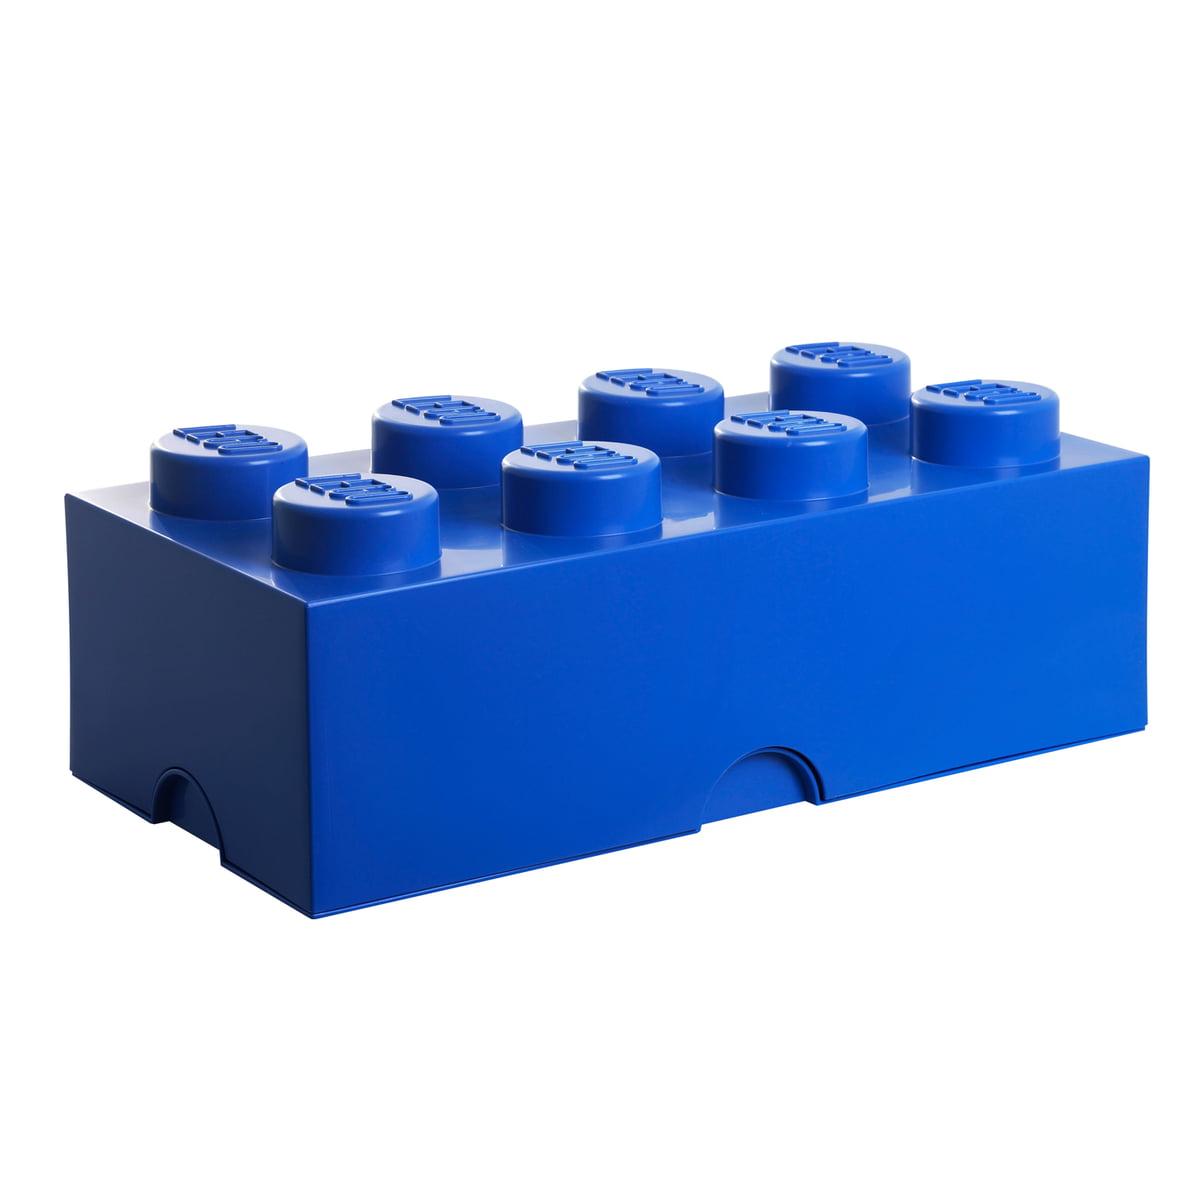 Lego - Storage Brick 8, blau | Kinderzimmer > Spielzeuge > Sonstige Spielzeuge | Blau | Kunststoff | Lego